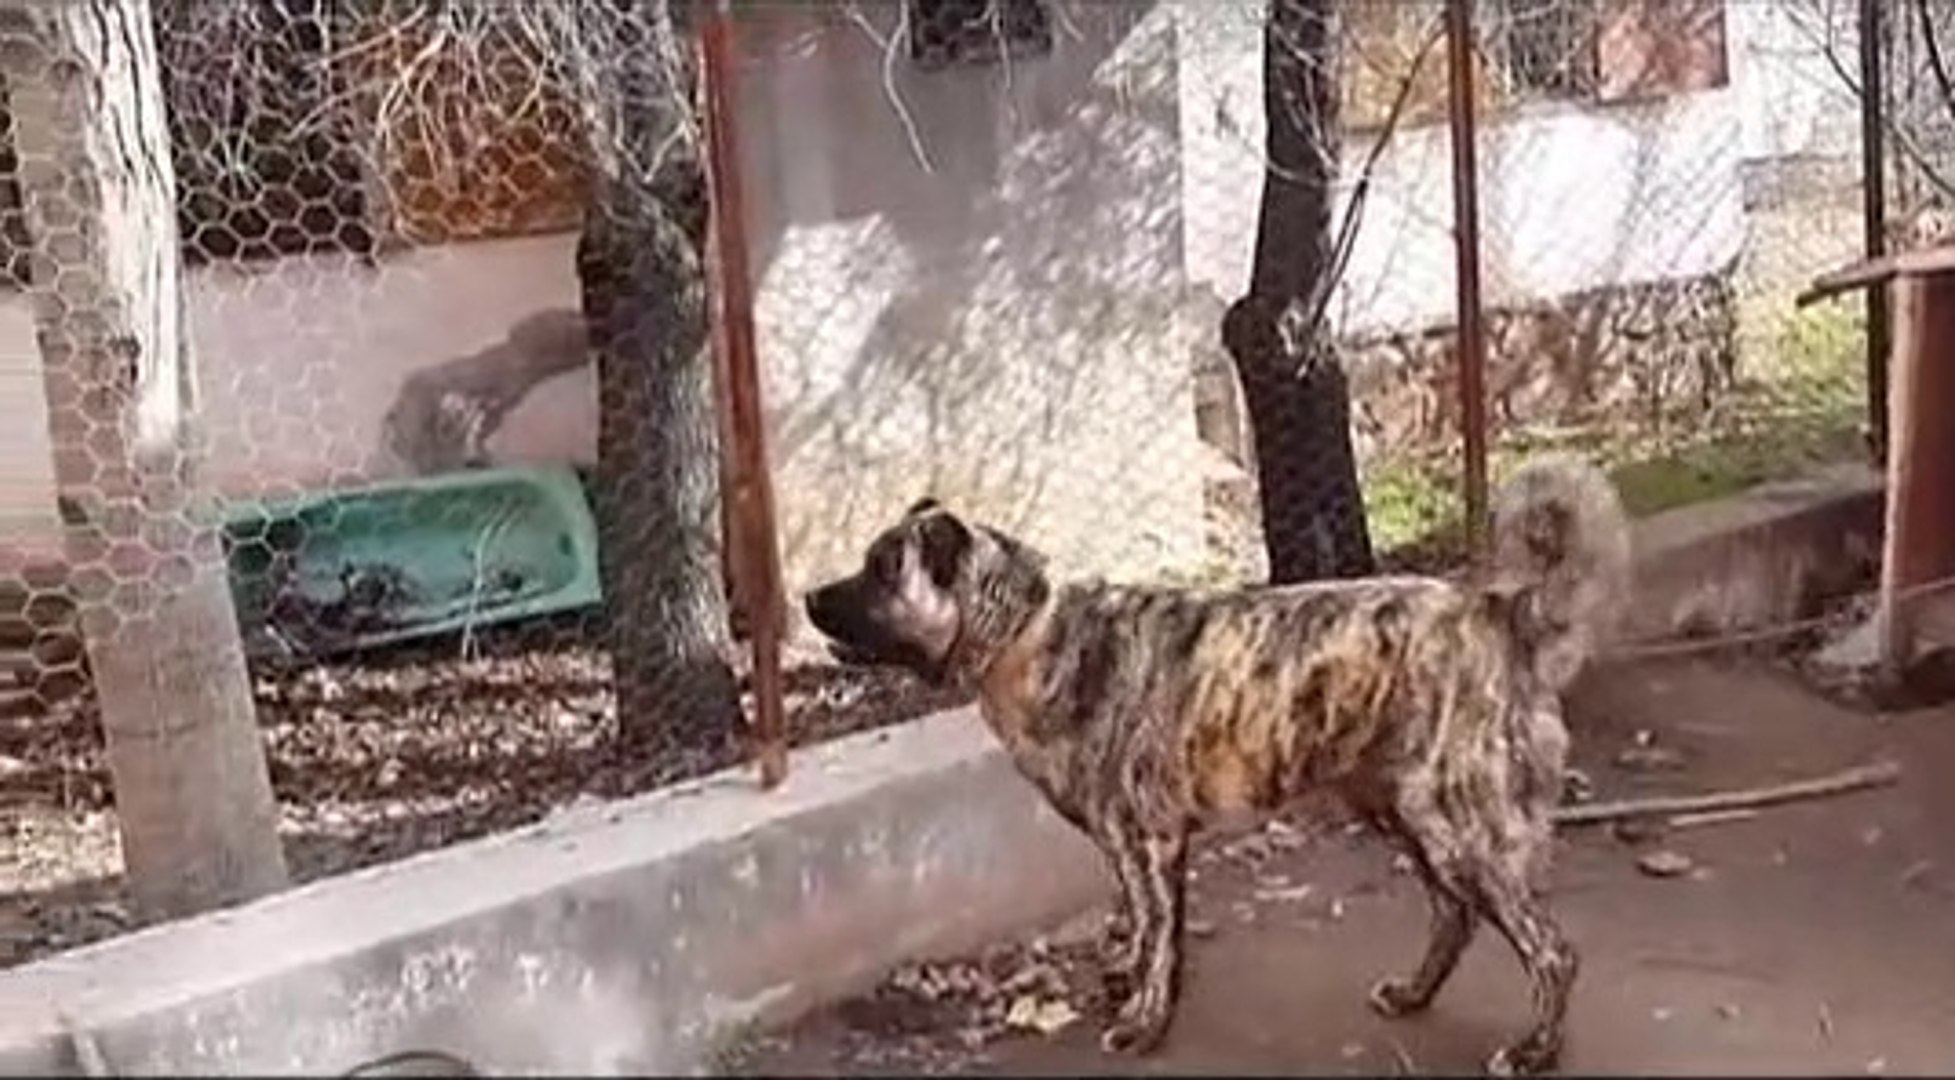 ADAMCI SiMiT KUYRUK CAPAR COBAN KOPEGi - ANATOLiAN SHEPHERD CAPAR DOG